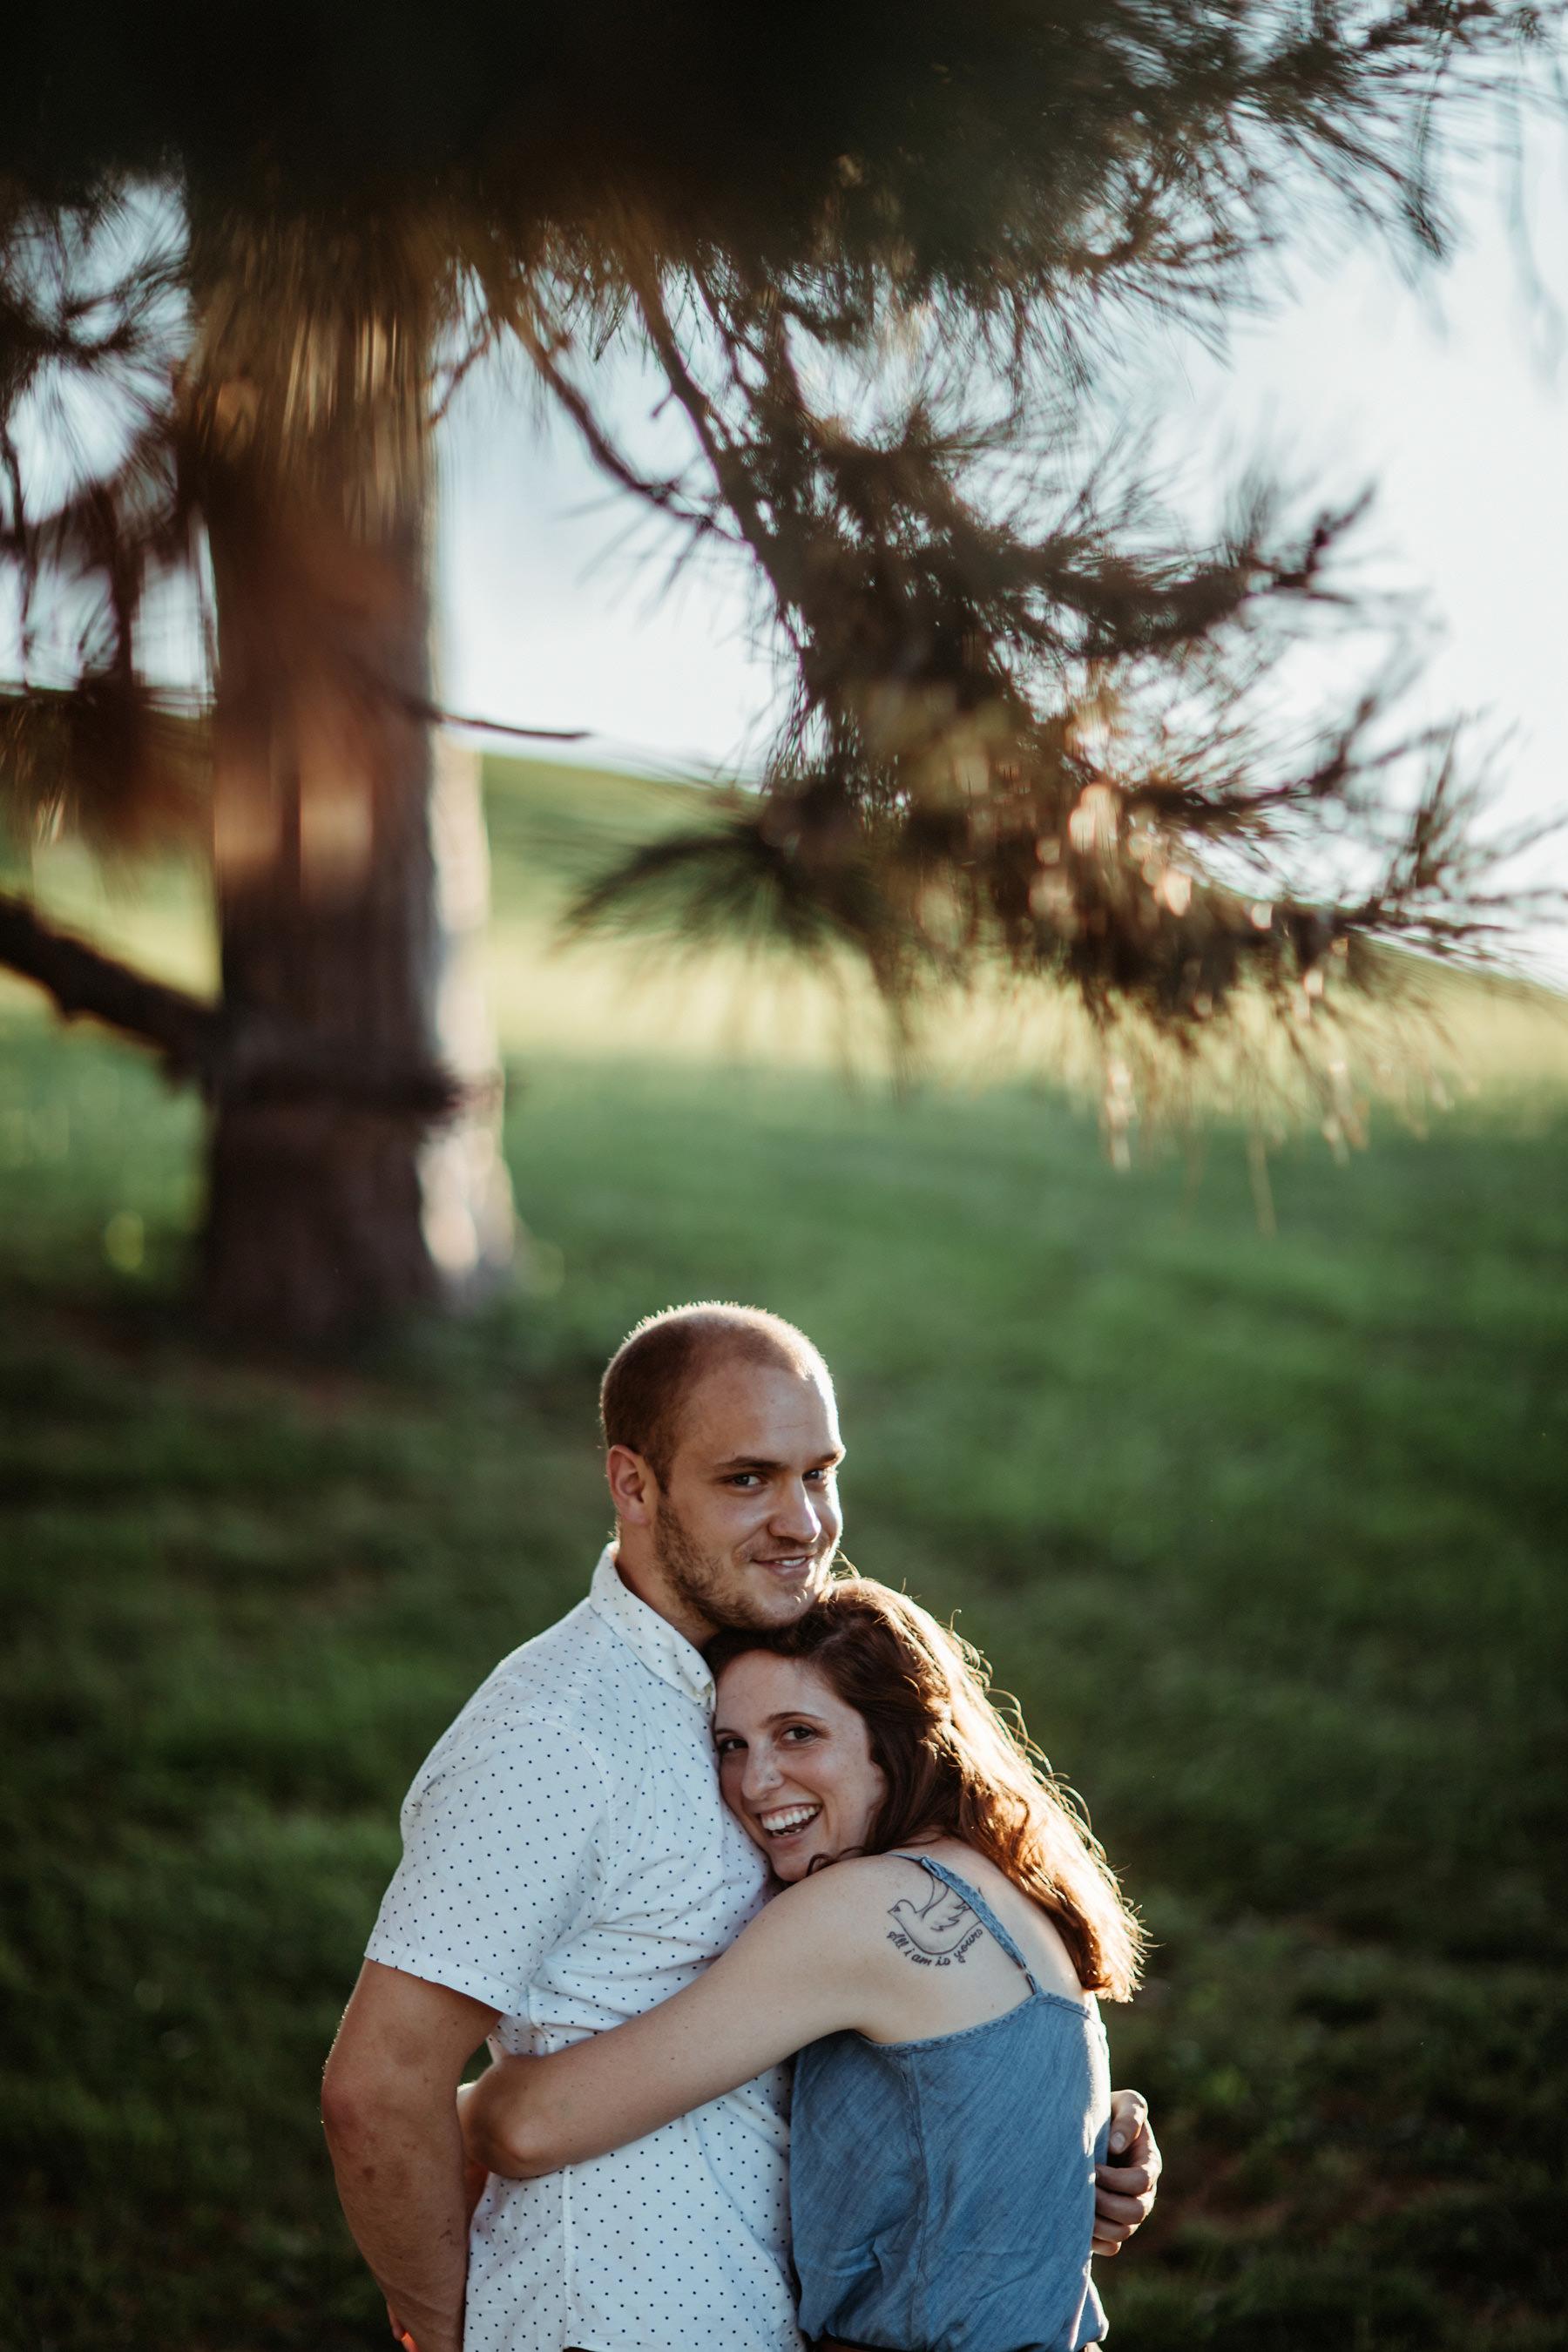 Kansas City_Penn Valley Park_Engagement Session_Kindling Wedding Photography08.JPG